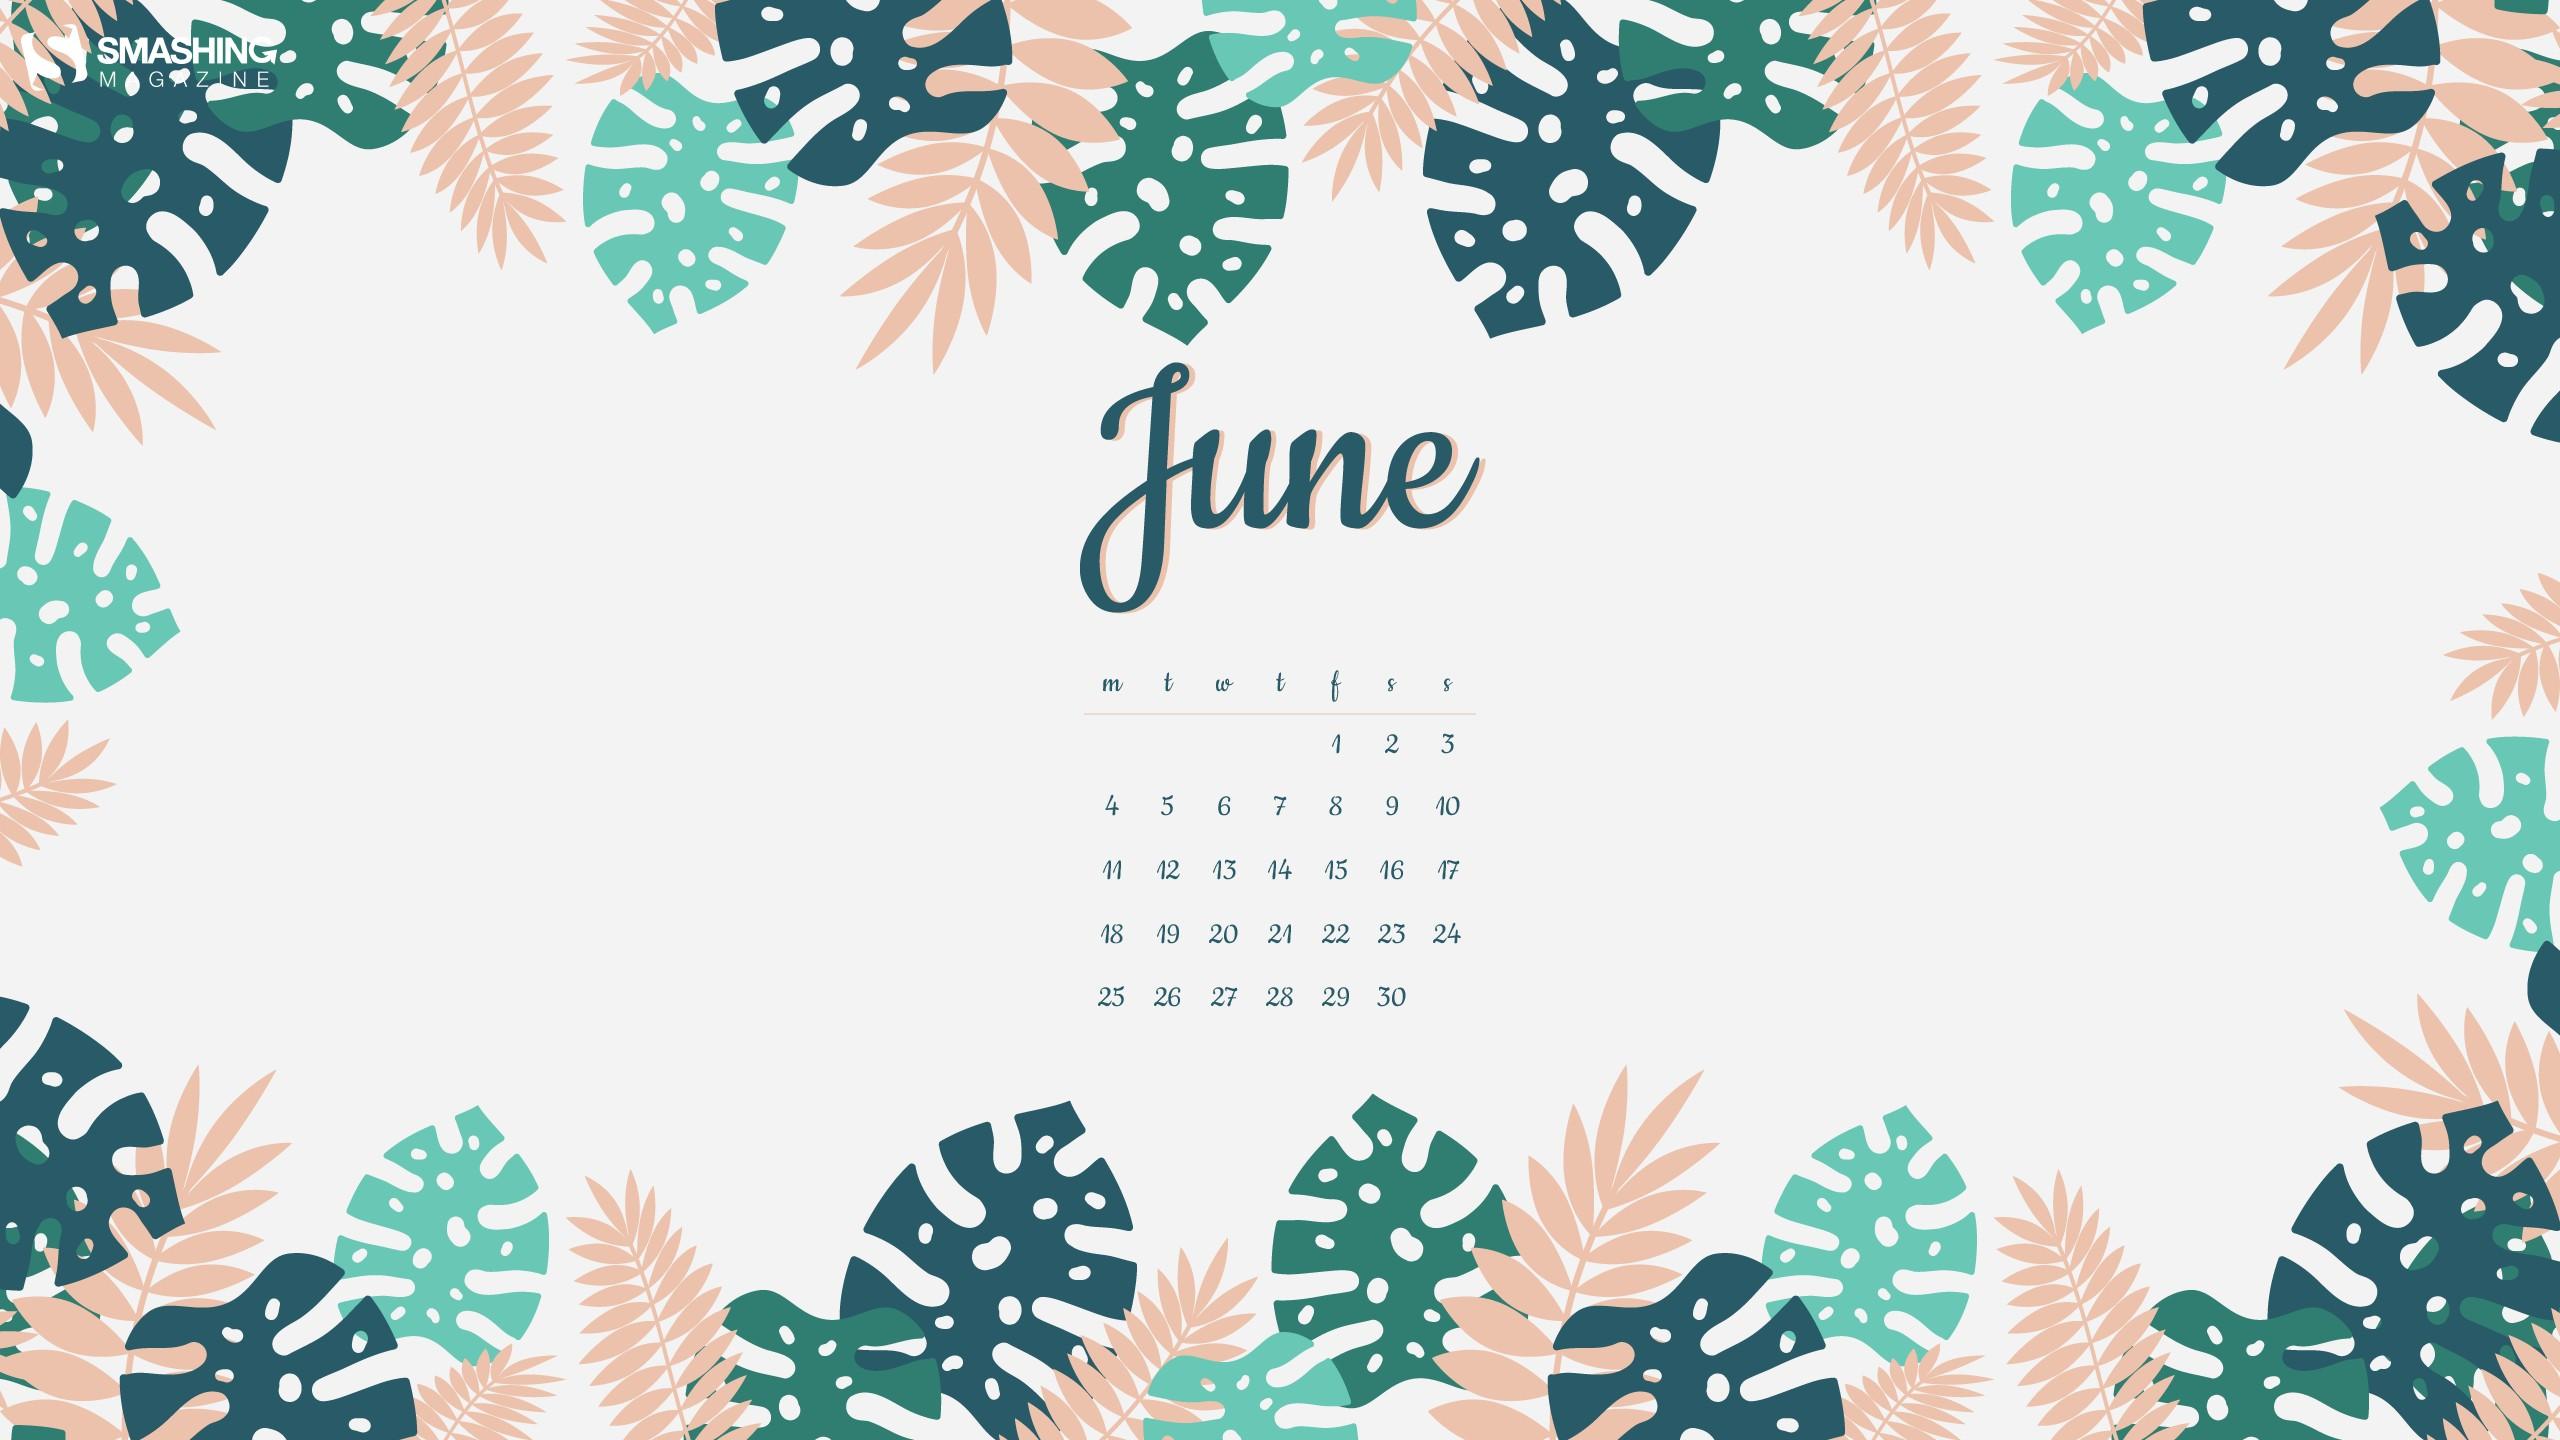 March Calendar Clip Art Más Populares Cheerful Desktop Wallpapers to Kick F June 2018 Edition Of March Calendar Clip Art Más Arriba-a-fecha Luxury Employee Schedule Template Excel